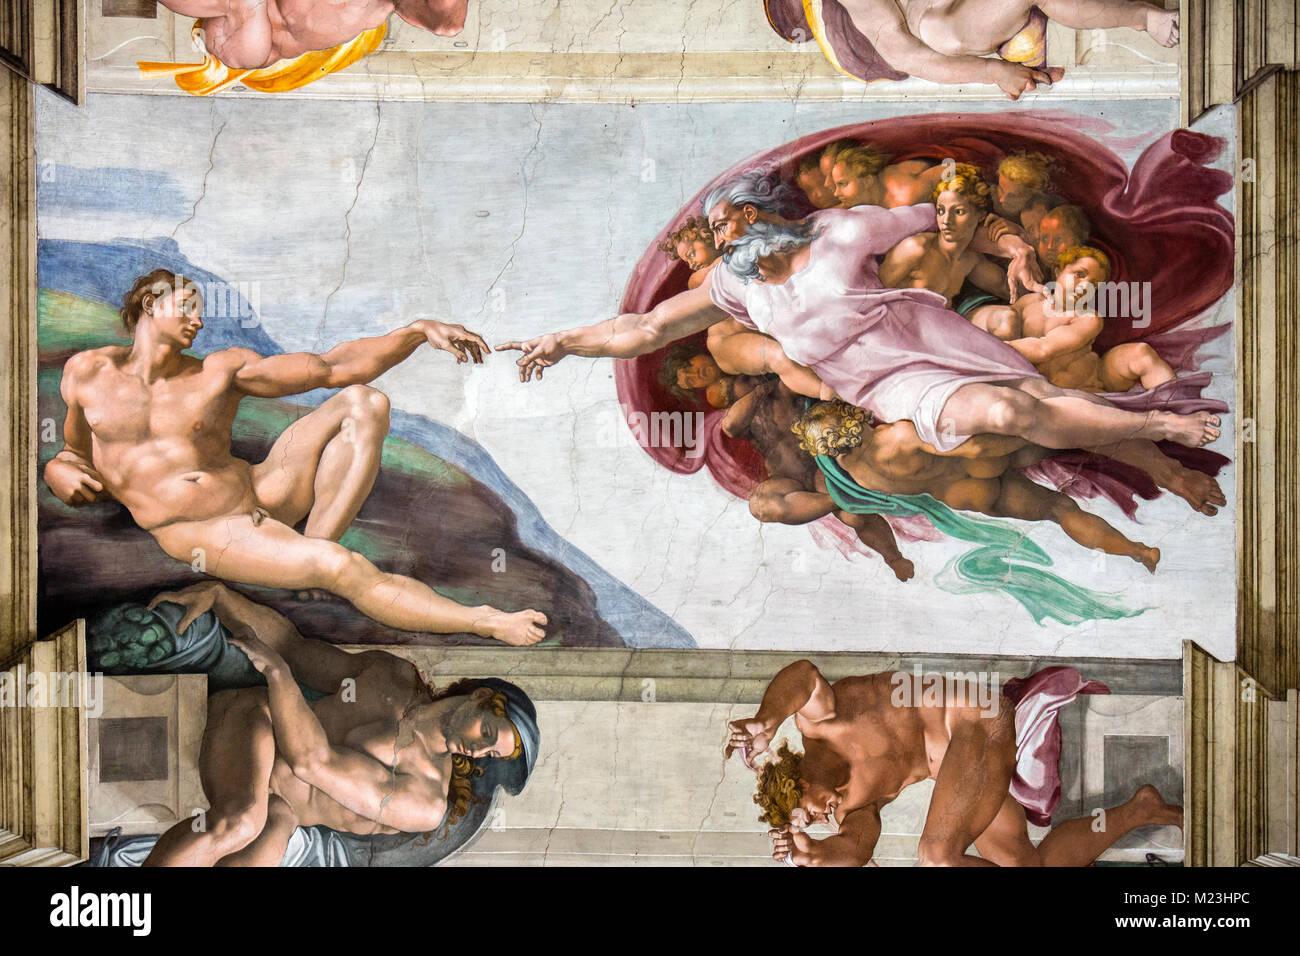 Michelangelo's Creation of Adam in the Sistine Chapel, Vatican museum, Rome, Italy - Stock Image